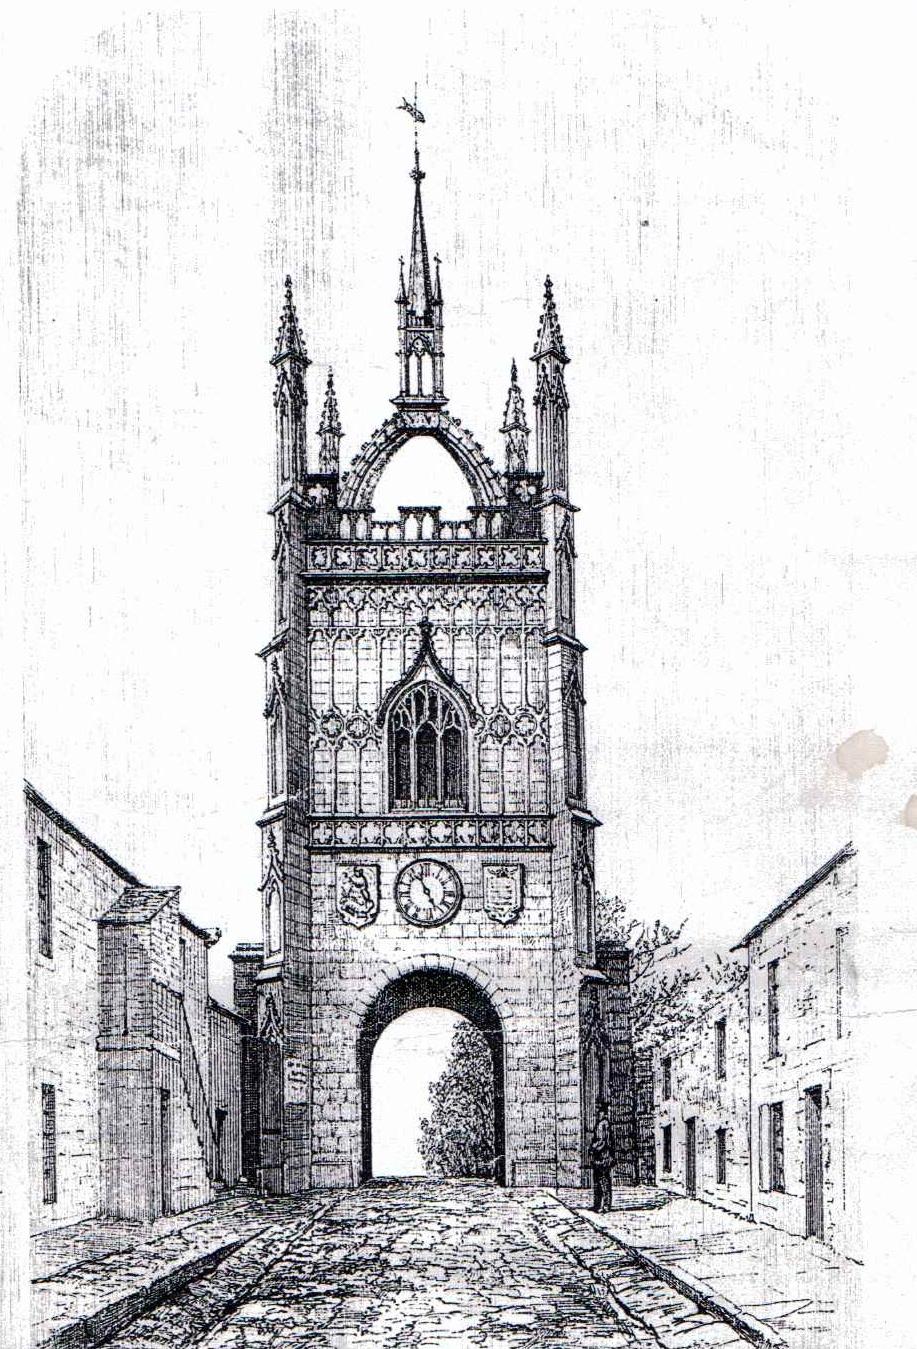 Pottergate Tower Alnwick